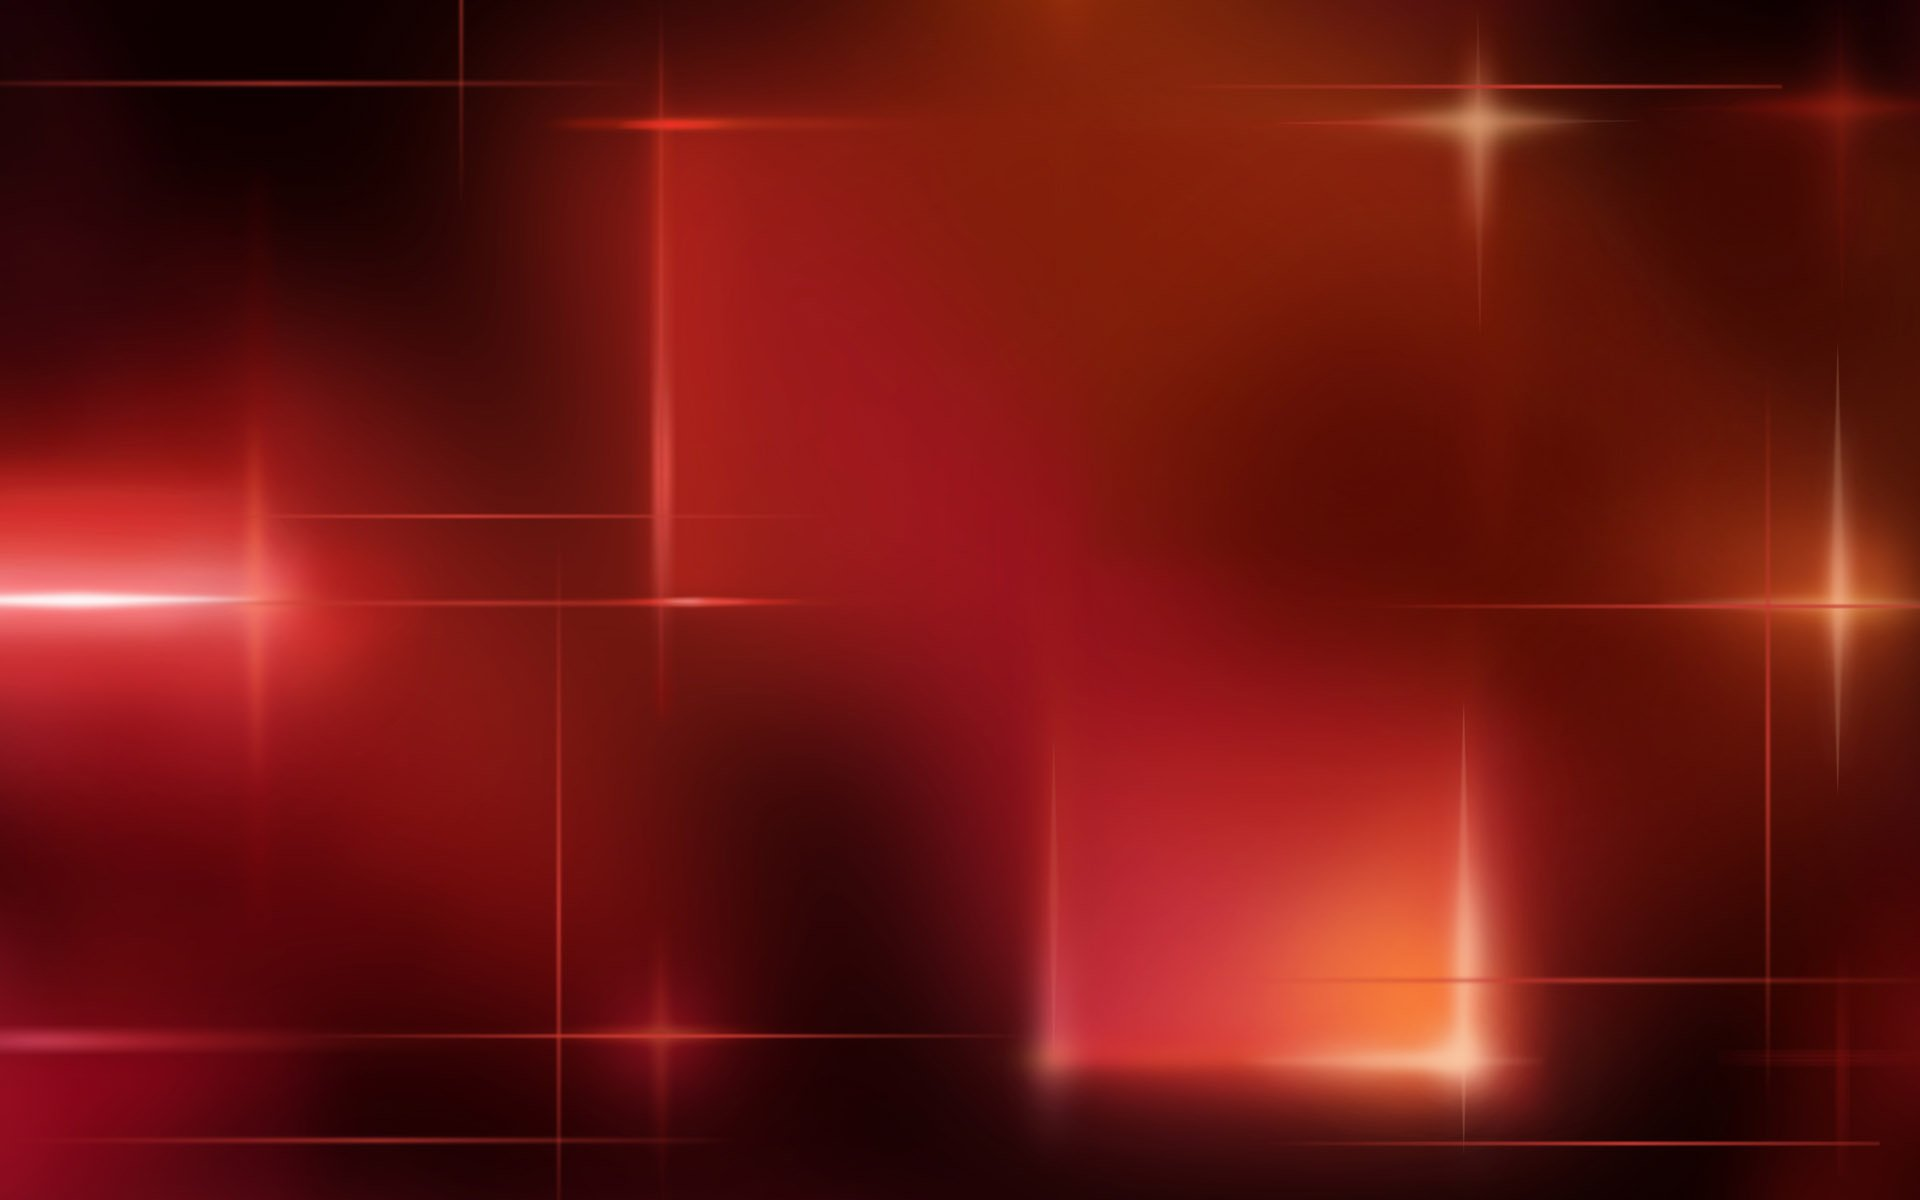 red abstract wallpaper paper wallpapers desktop 1920x1200 1920x1200